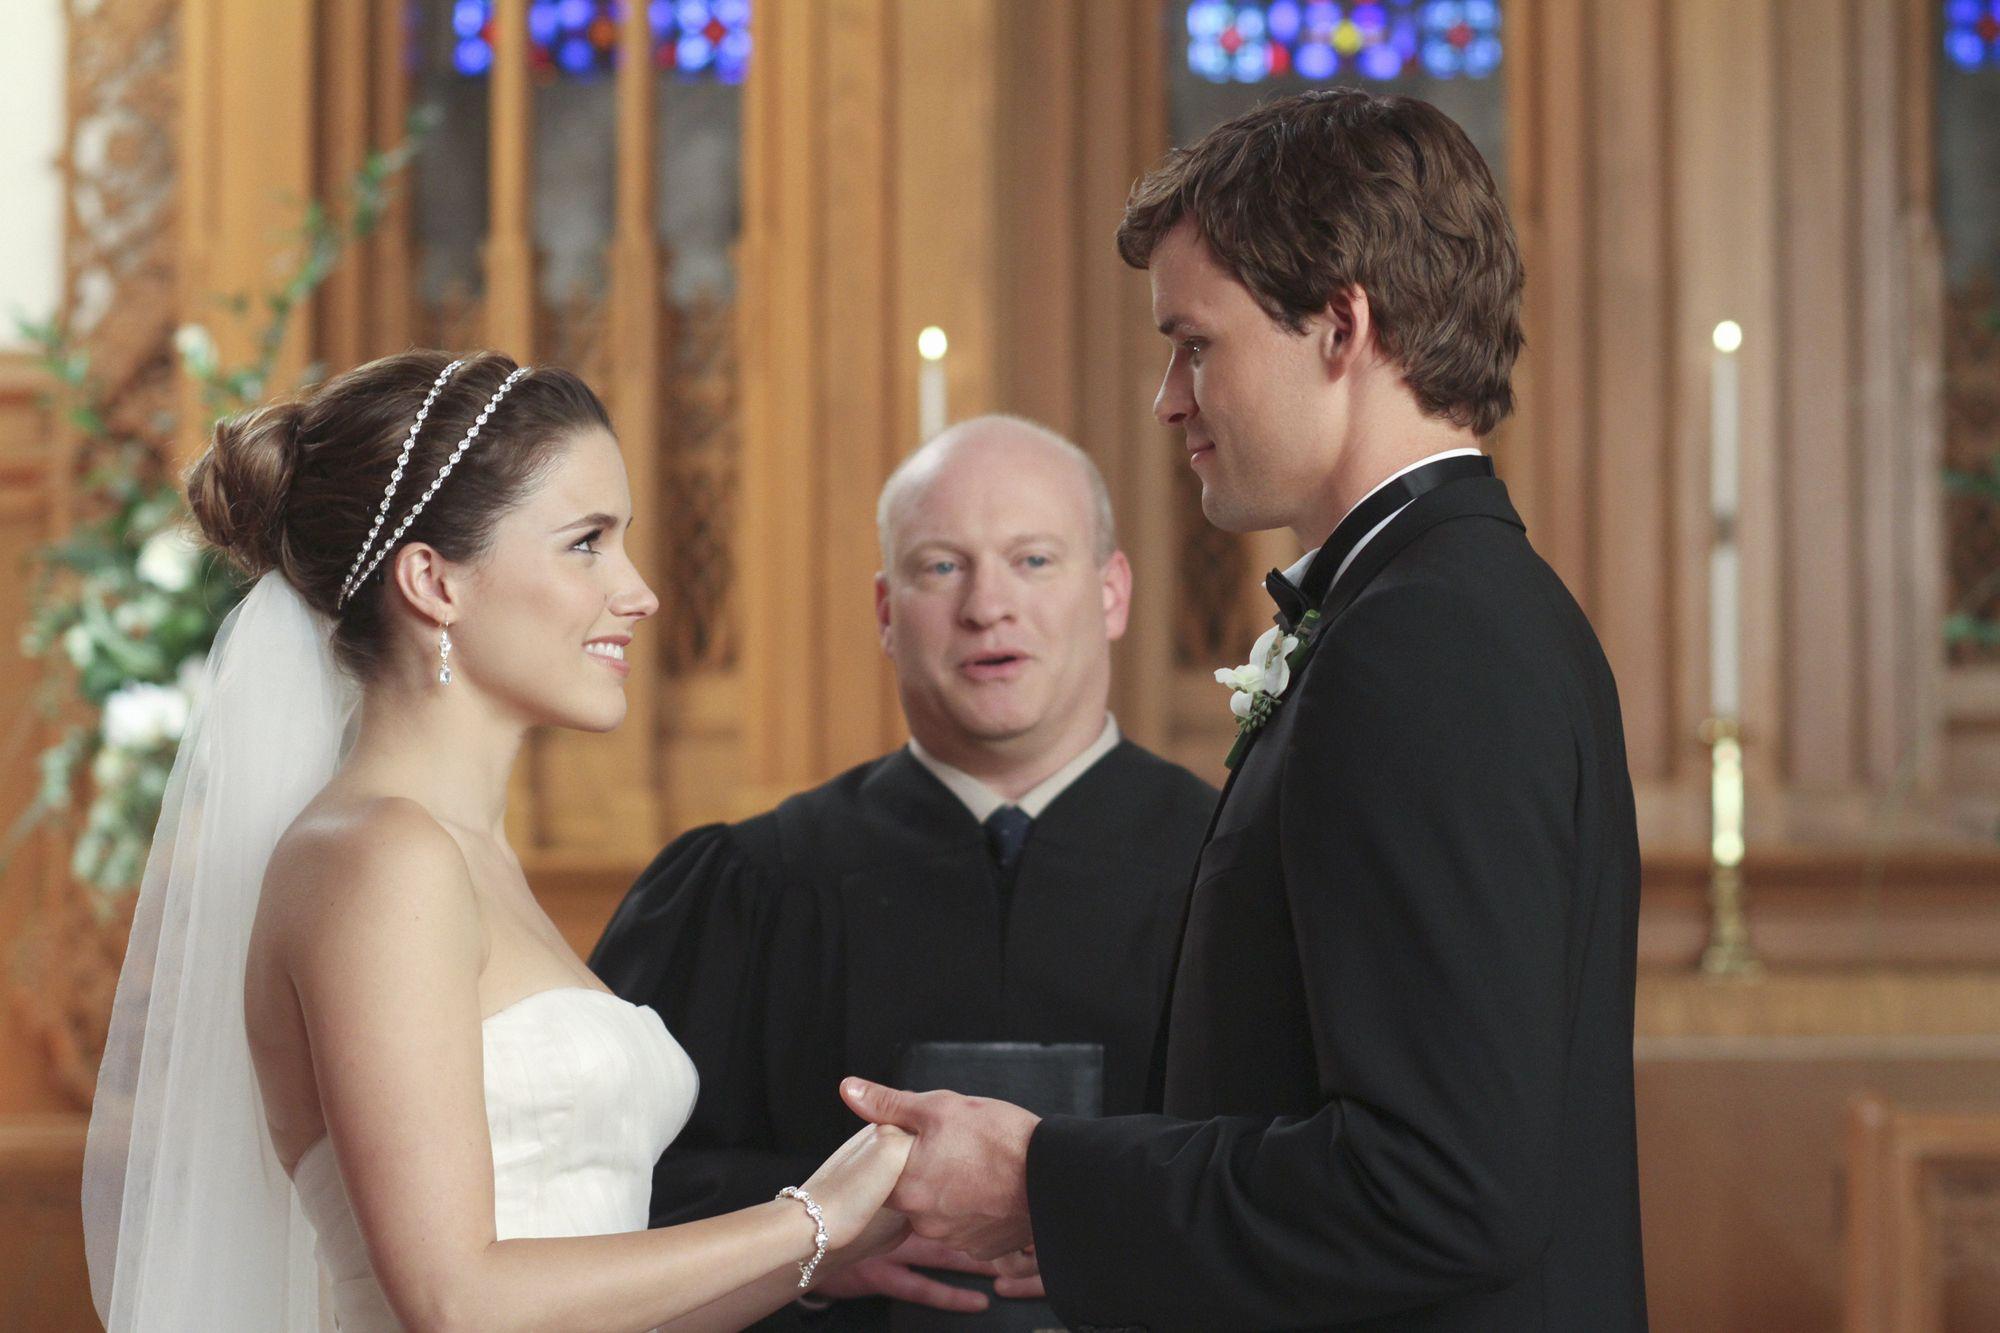 oth brookes wedding speech